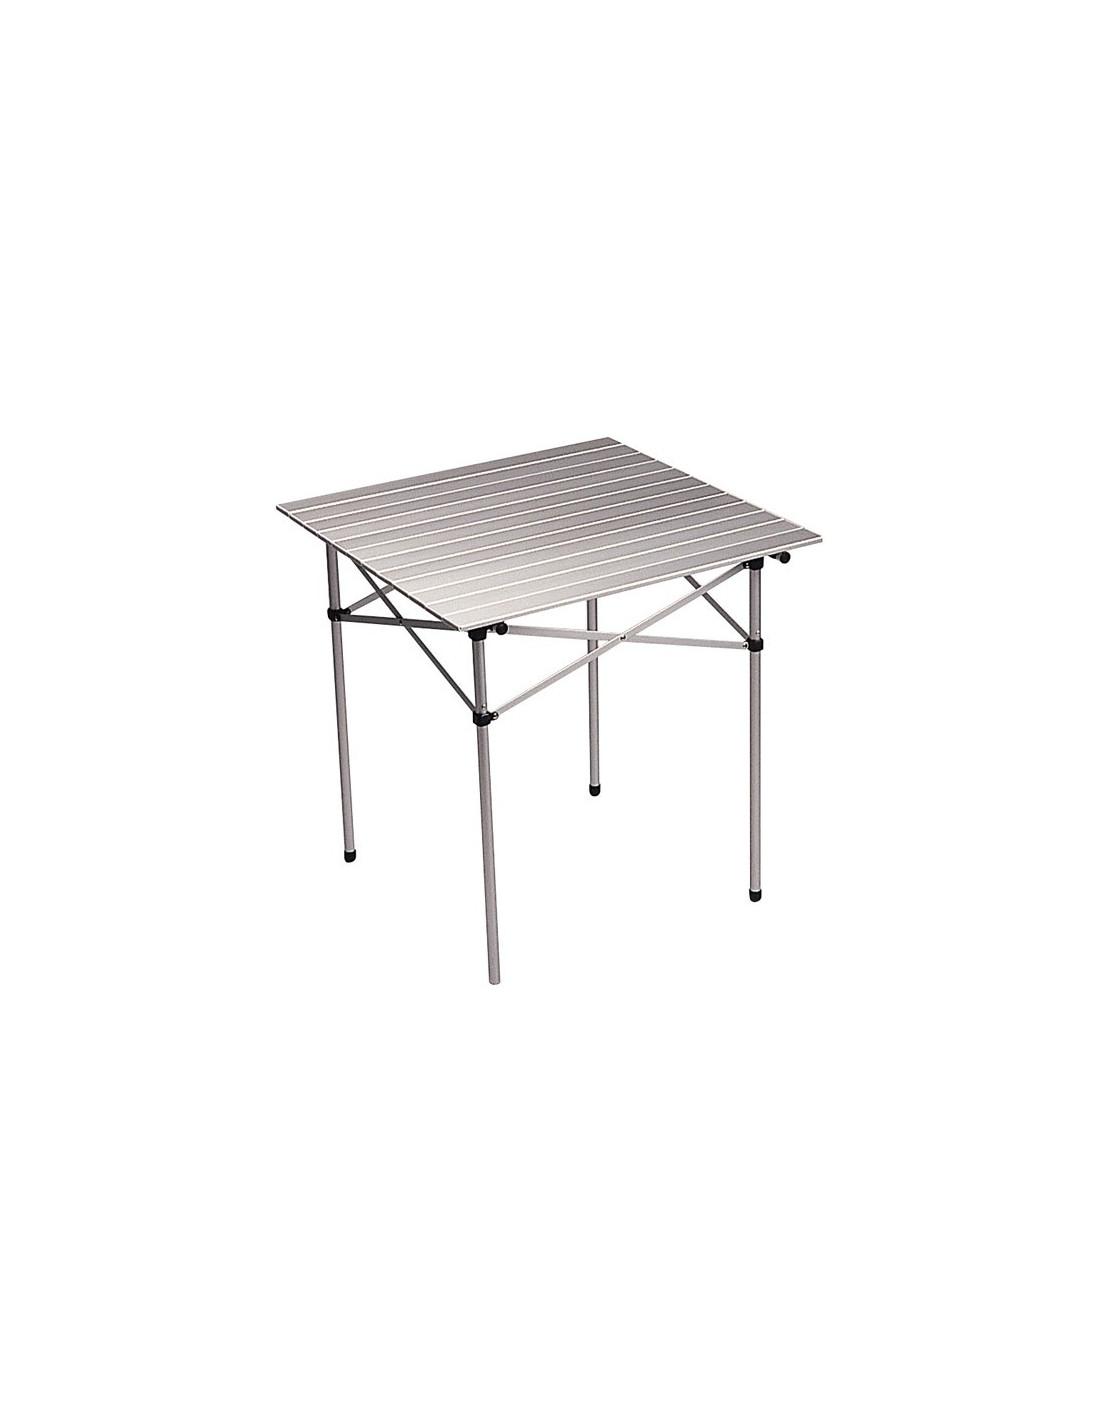 Mesa cuadrada aluminio plegable 70x70 cm midland tienda for Mesa plegable de aluminio para camping